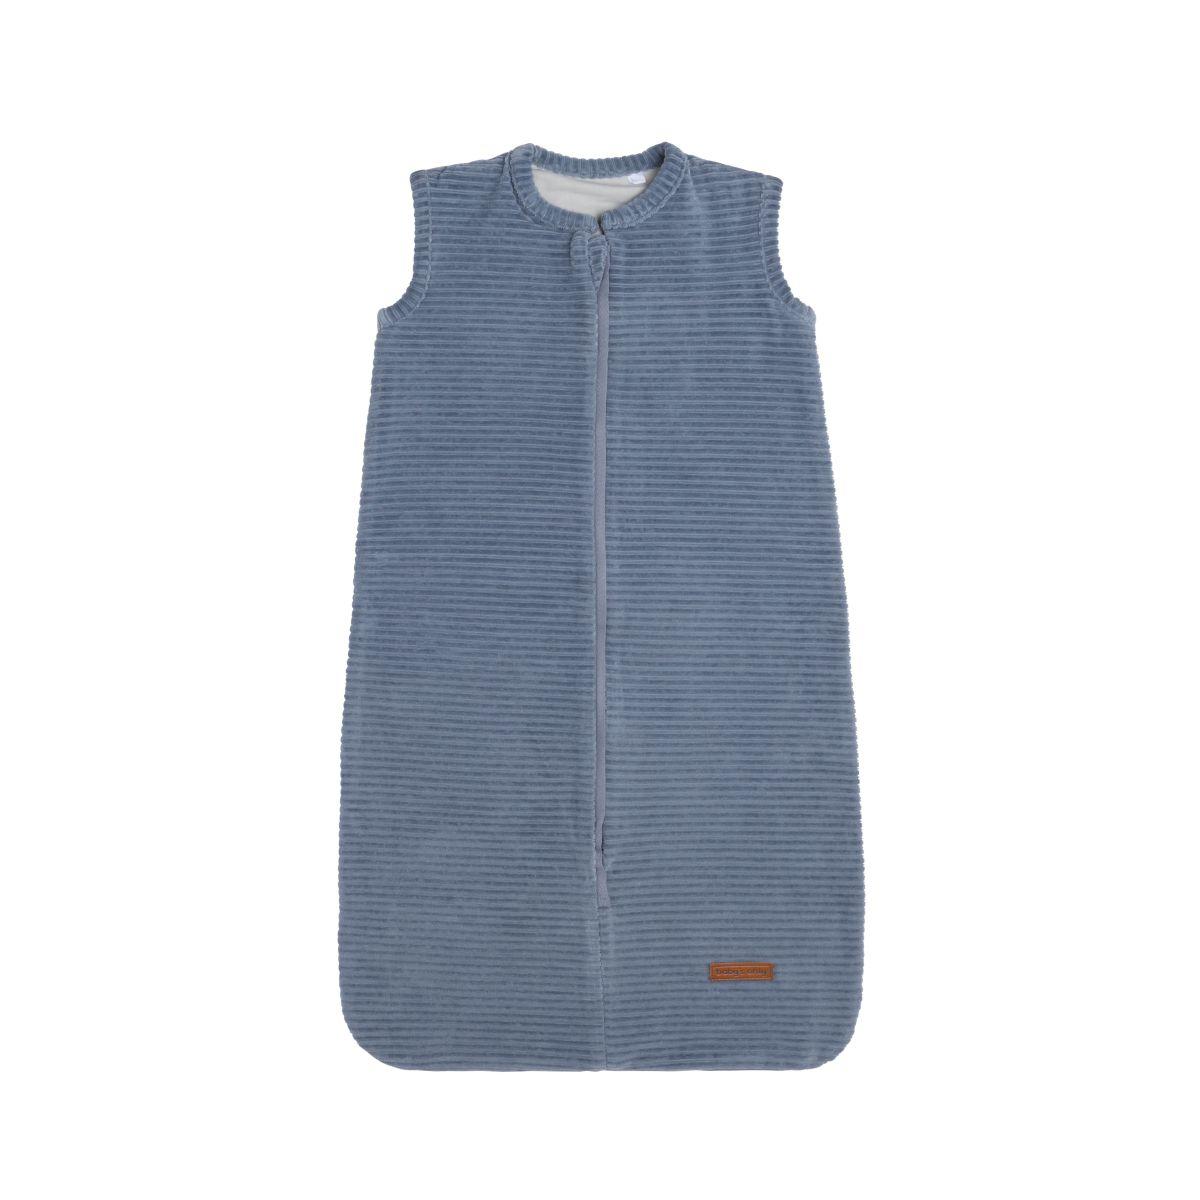 babys only bo02407303851 sense slaapzak vintage blue 90 cm 1